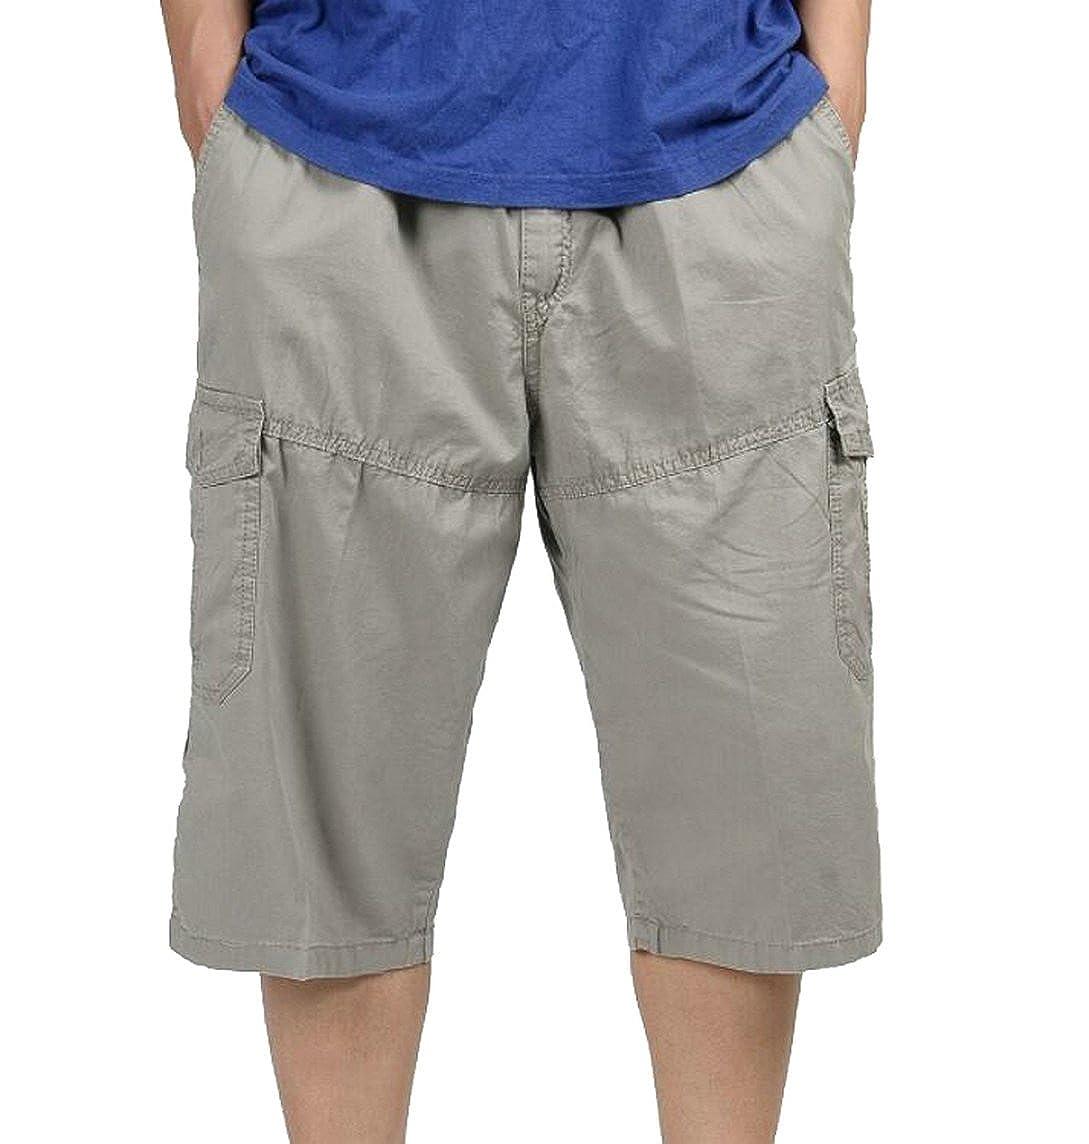 8d66d775f0 Oberora-Men Casual Mid Waist Multi Pockets Plus Size Cargo Shorts Pants